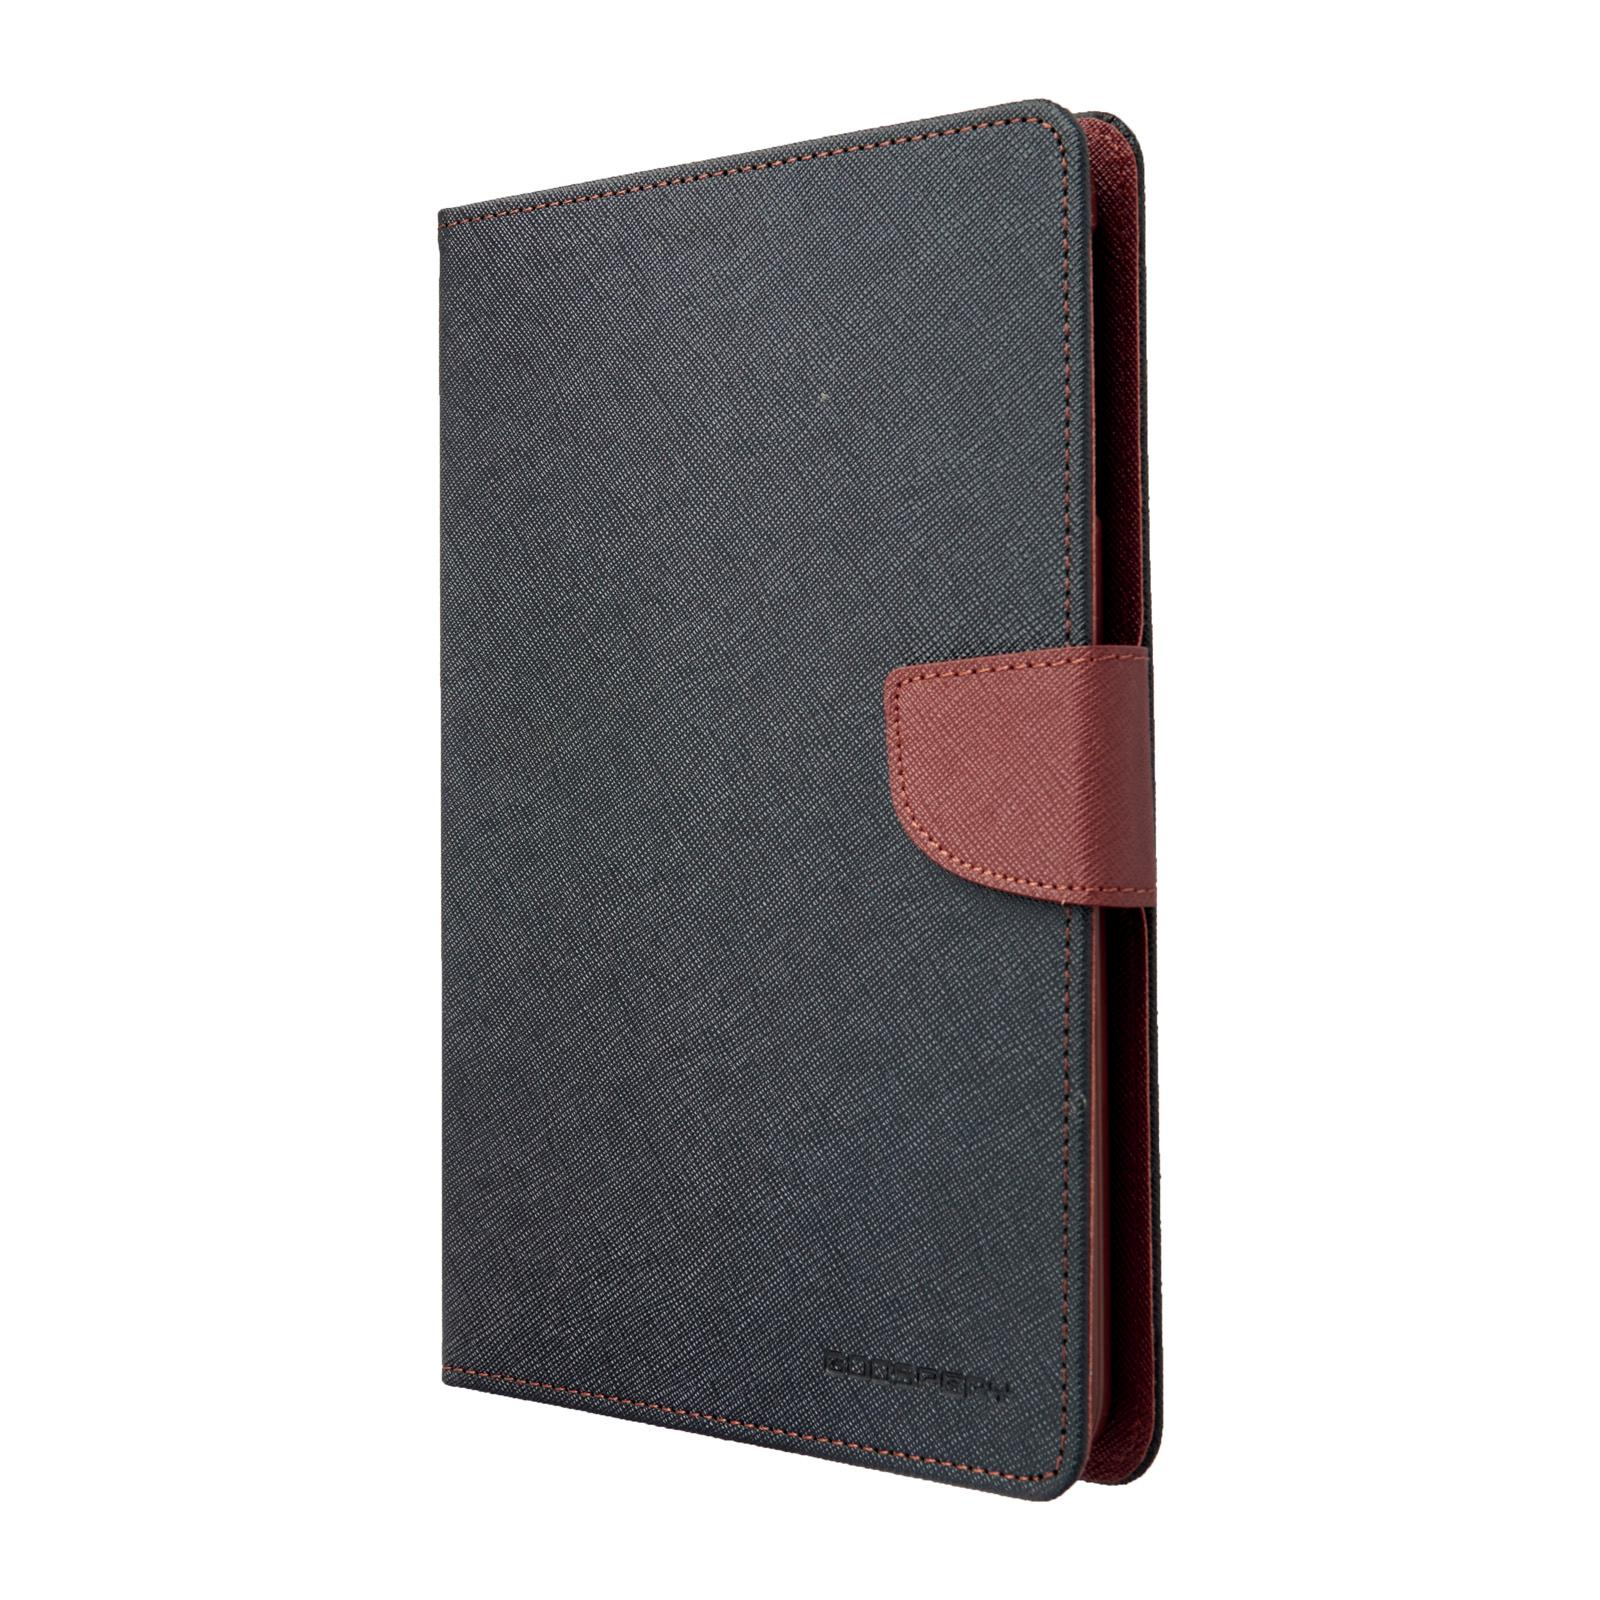 Pouzdro / kryt pro Apple iPad mini 1 / 2 / 3 - Mercury, Fancy Diary Black/Brown